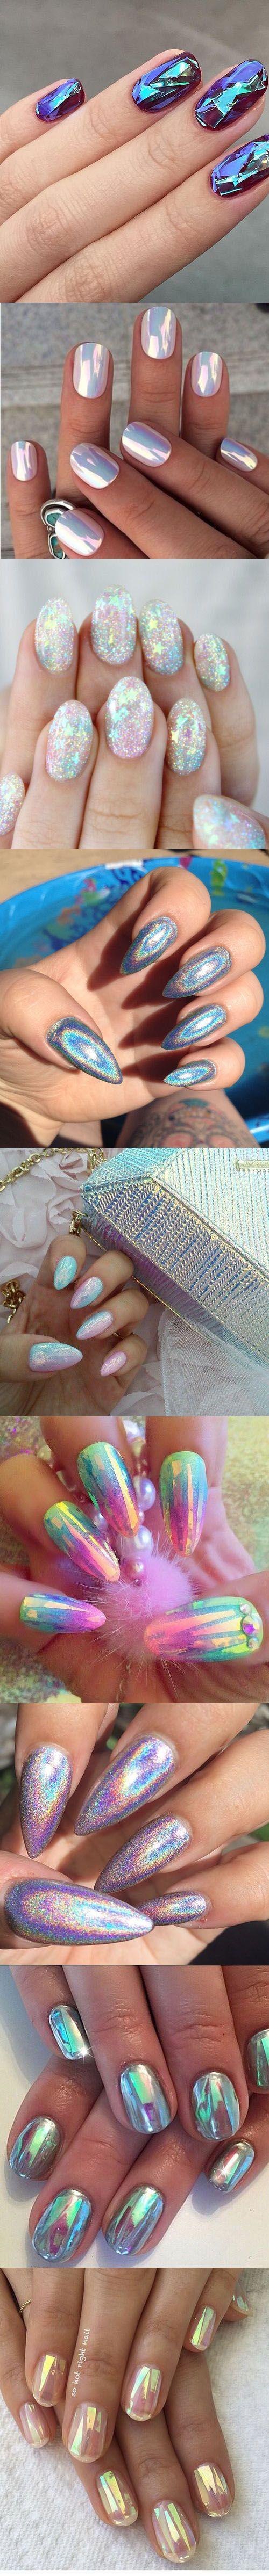 Holographic mermaid nails #manicure | ko-te.com by @evatornado ...